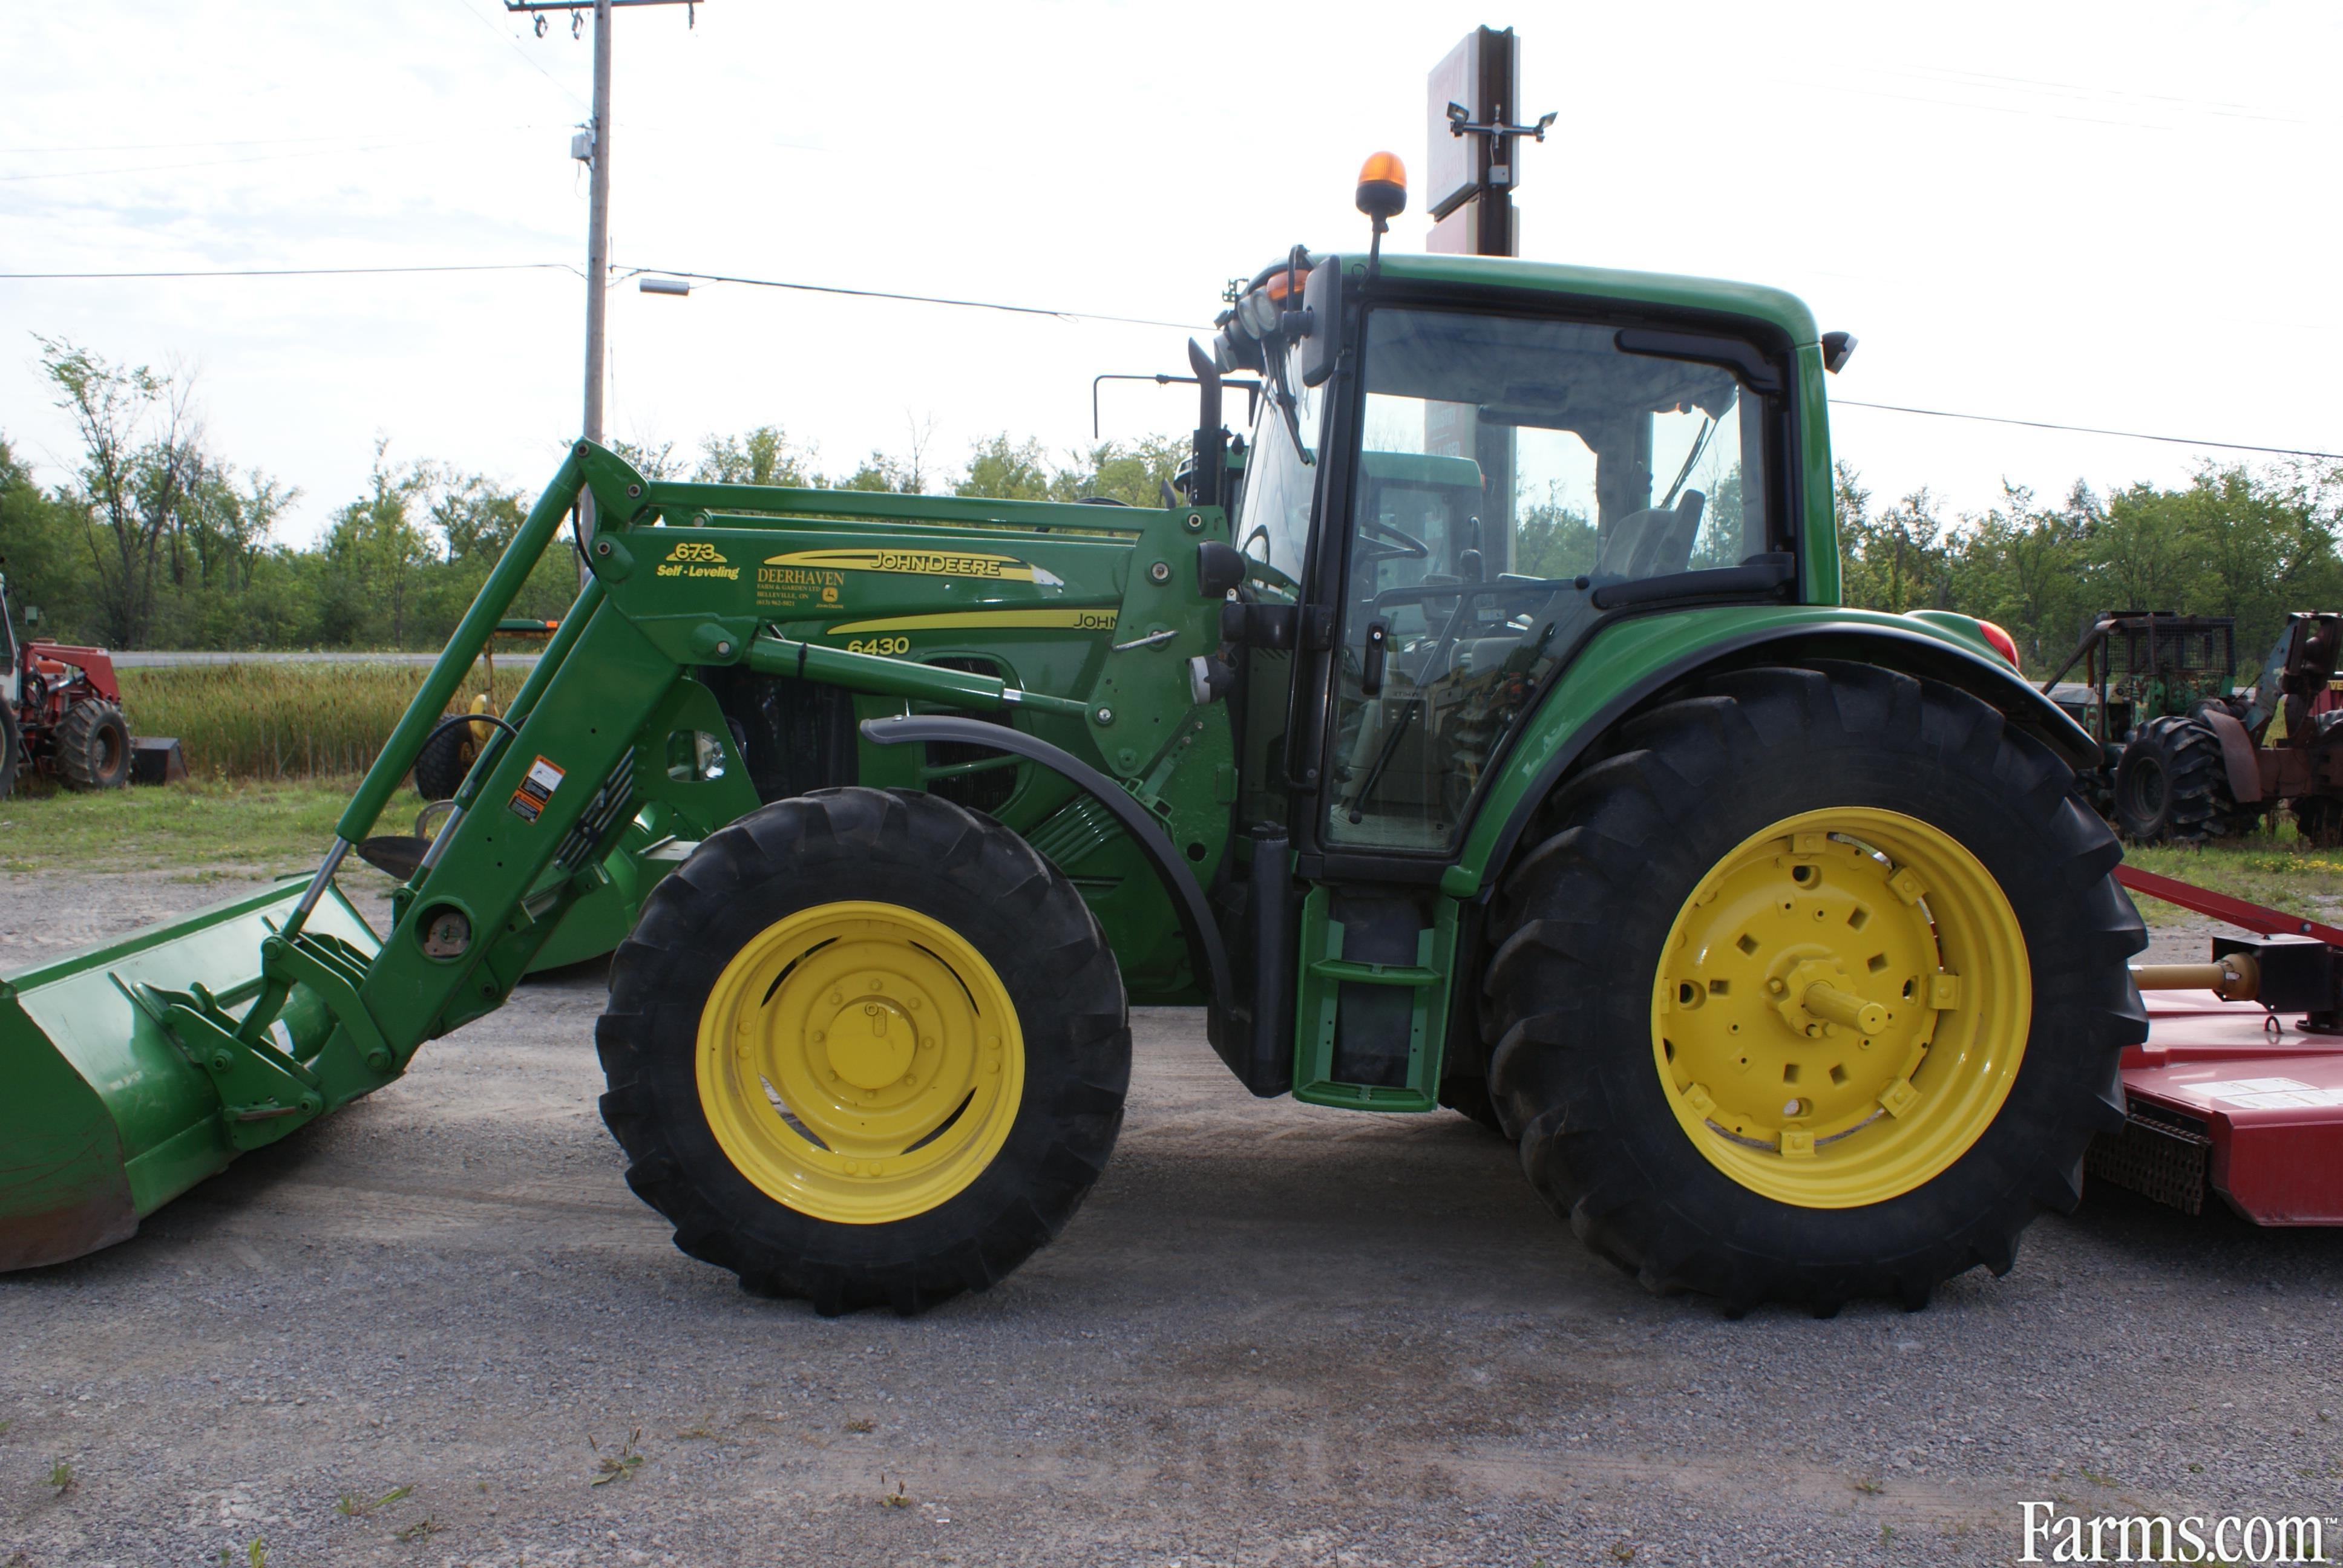 John Deere Farm Tractors Parts : John deere premium for sale farms